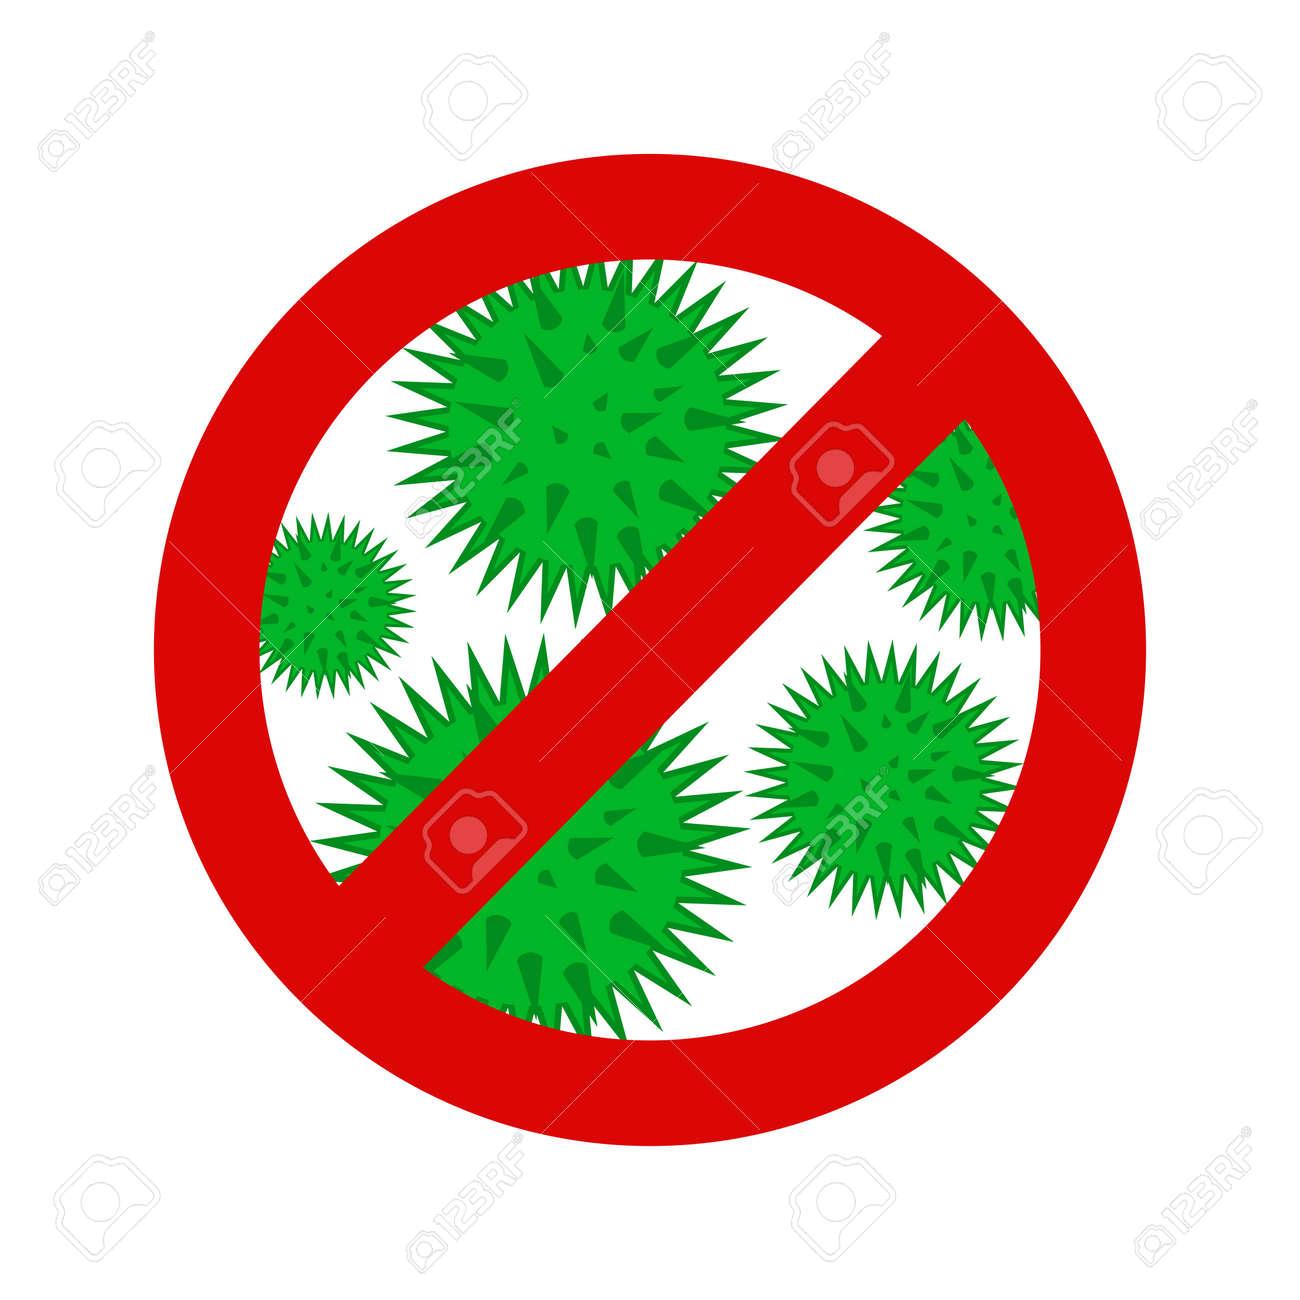 novel respiratory coronavirus 2019 and red stop Cov prohibition sign. Caution 2019-nCoV virus. COVID-2019 disease outbreak. Prevent dangerous pandemic. Antiviral vaccine icon. warning emblem illustration. - 144801559